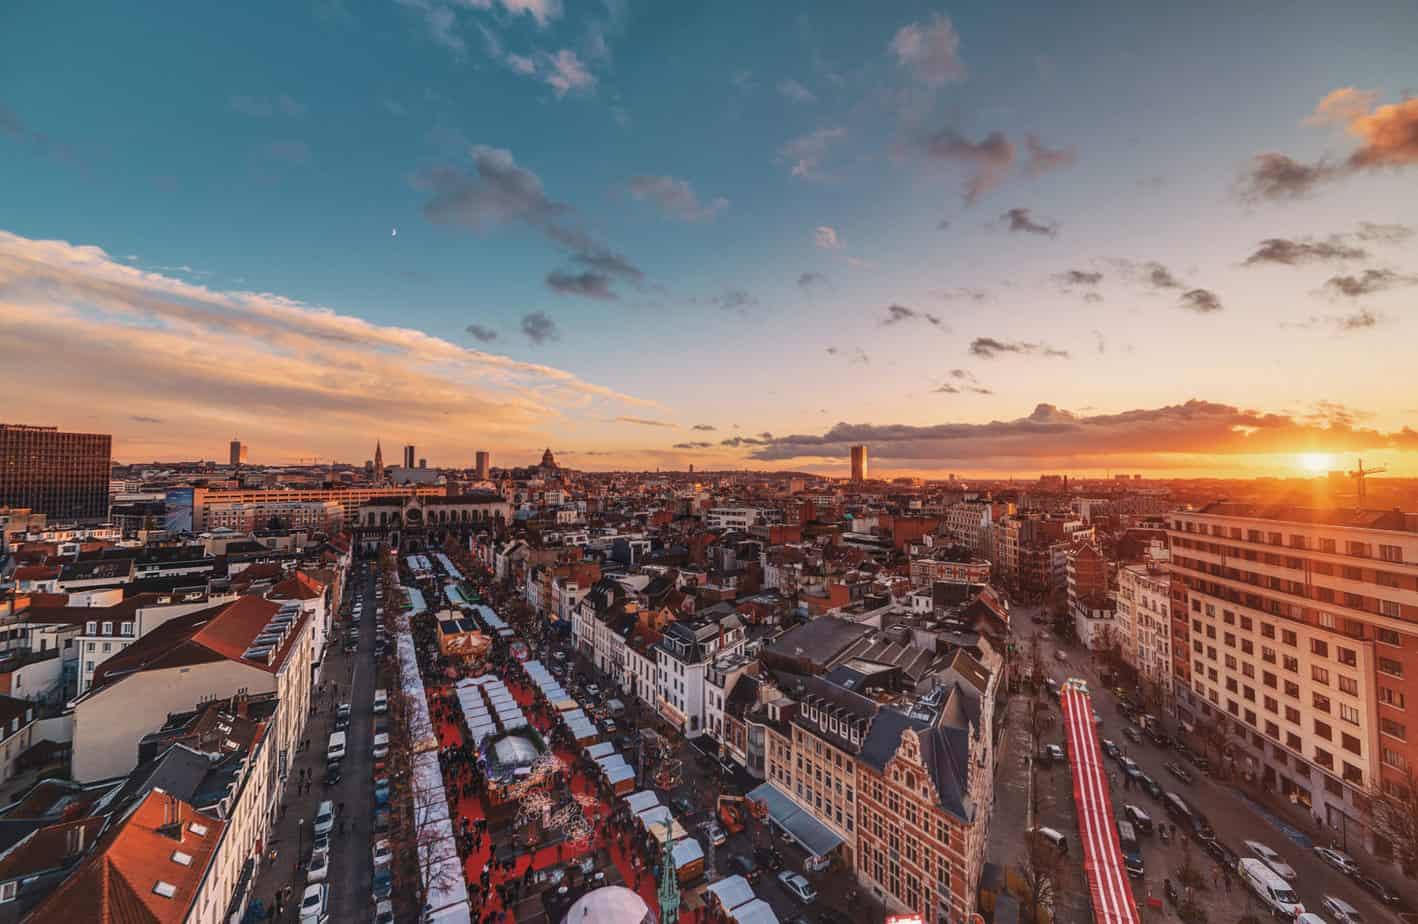 Brussel, Belgie